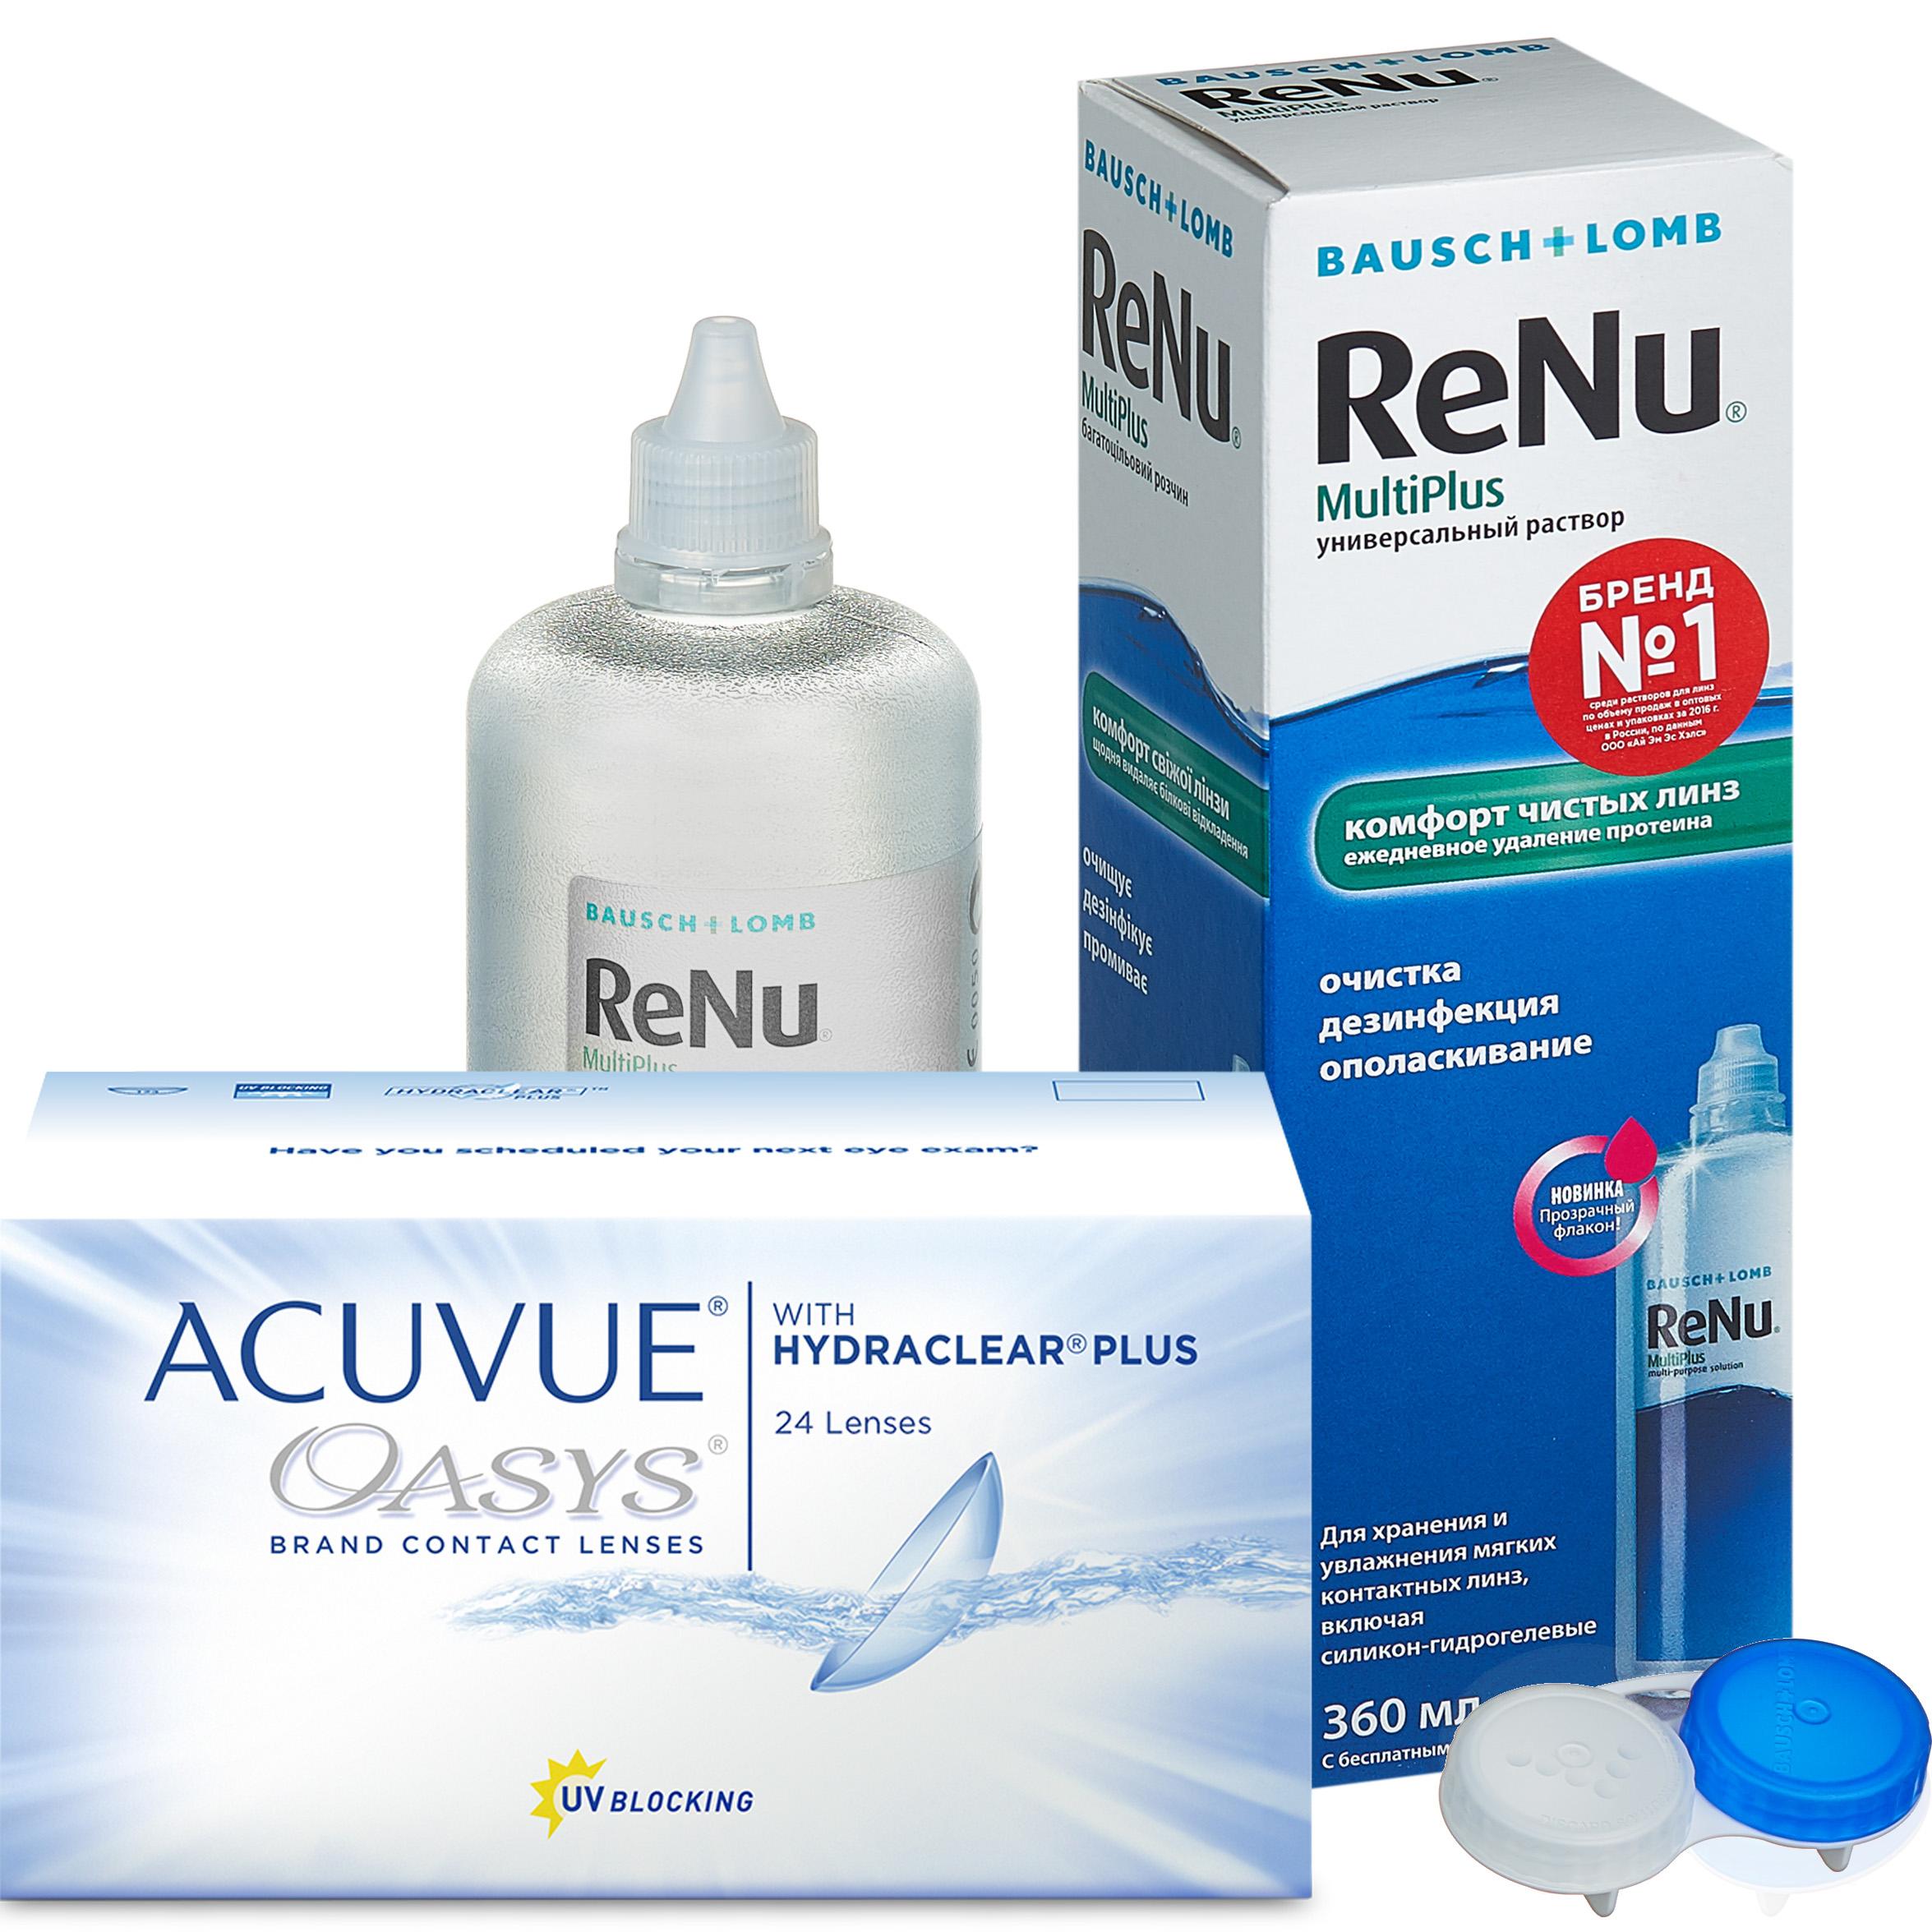 Купить Oasys with Hydraclear Plus 24 линзы + ReNu MultiPlus, Линзы Acuvue Oasys with Hydraclear Plus 24 линзы R 8.8 +4, 50 + ReNu Multi Plus 360 мл